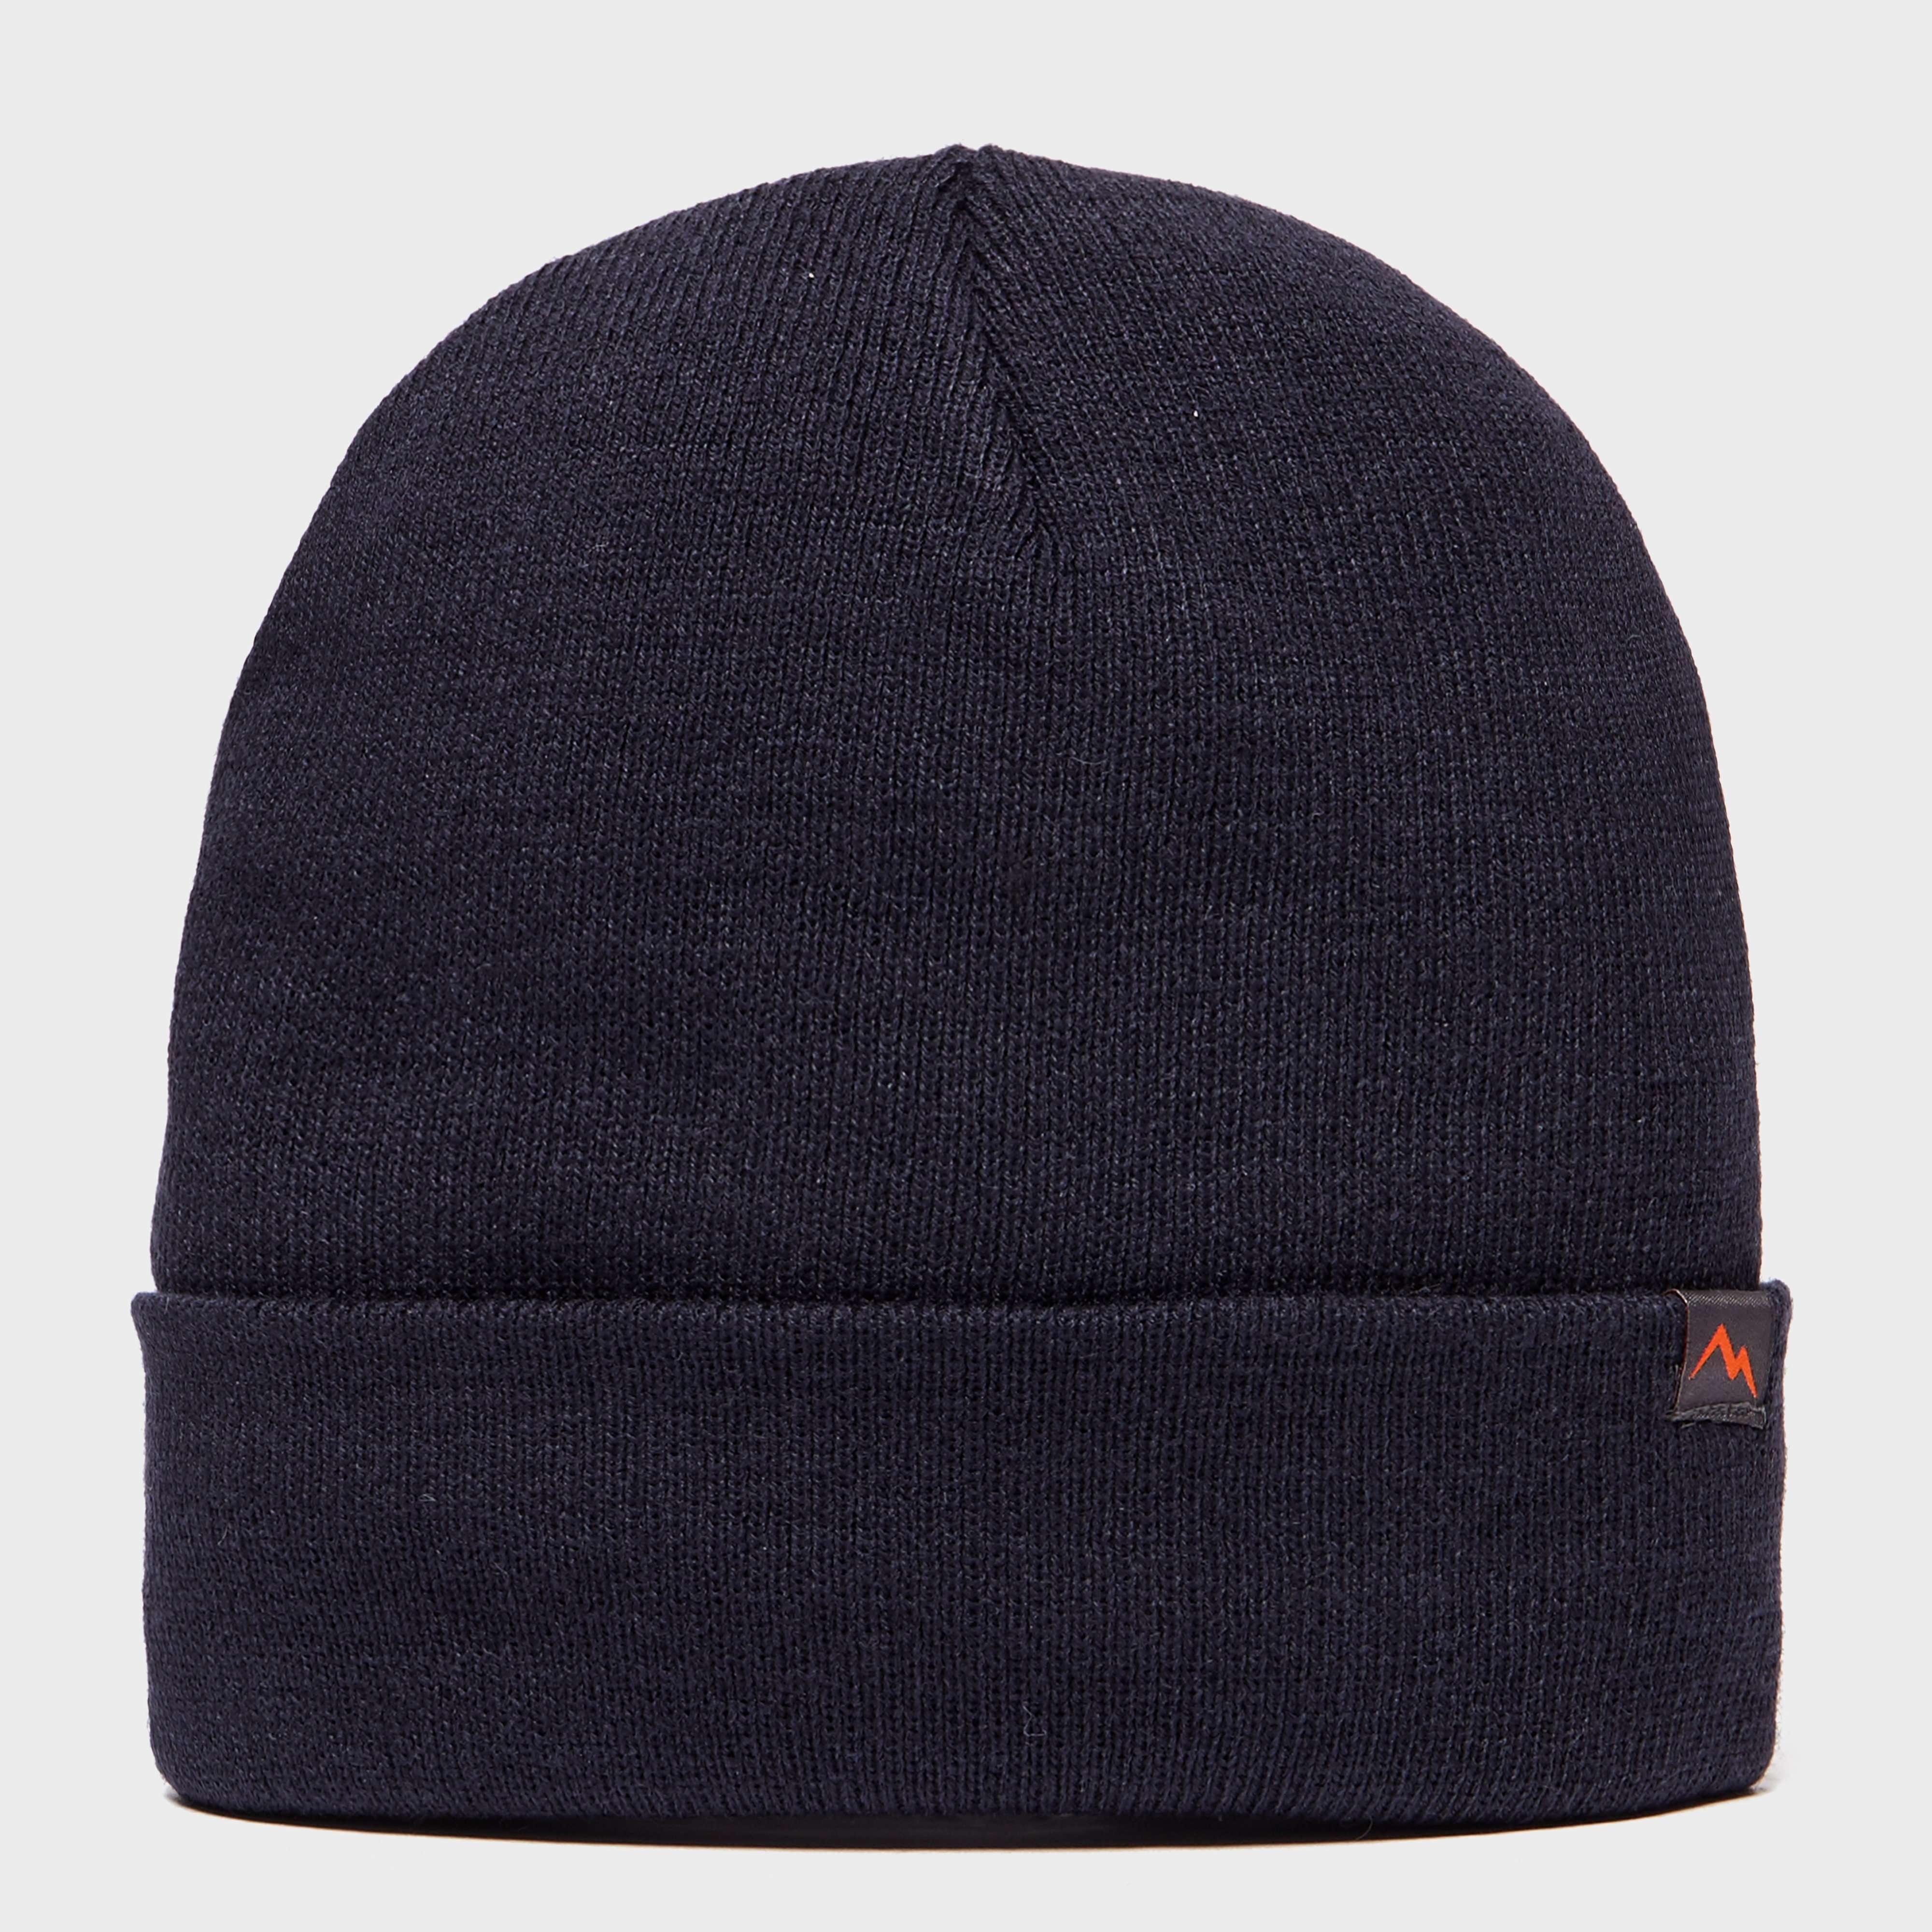 PETER STORM Unisex Thinsulate Beanie Hat